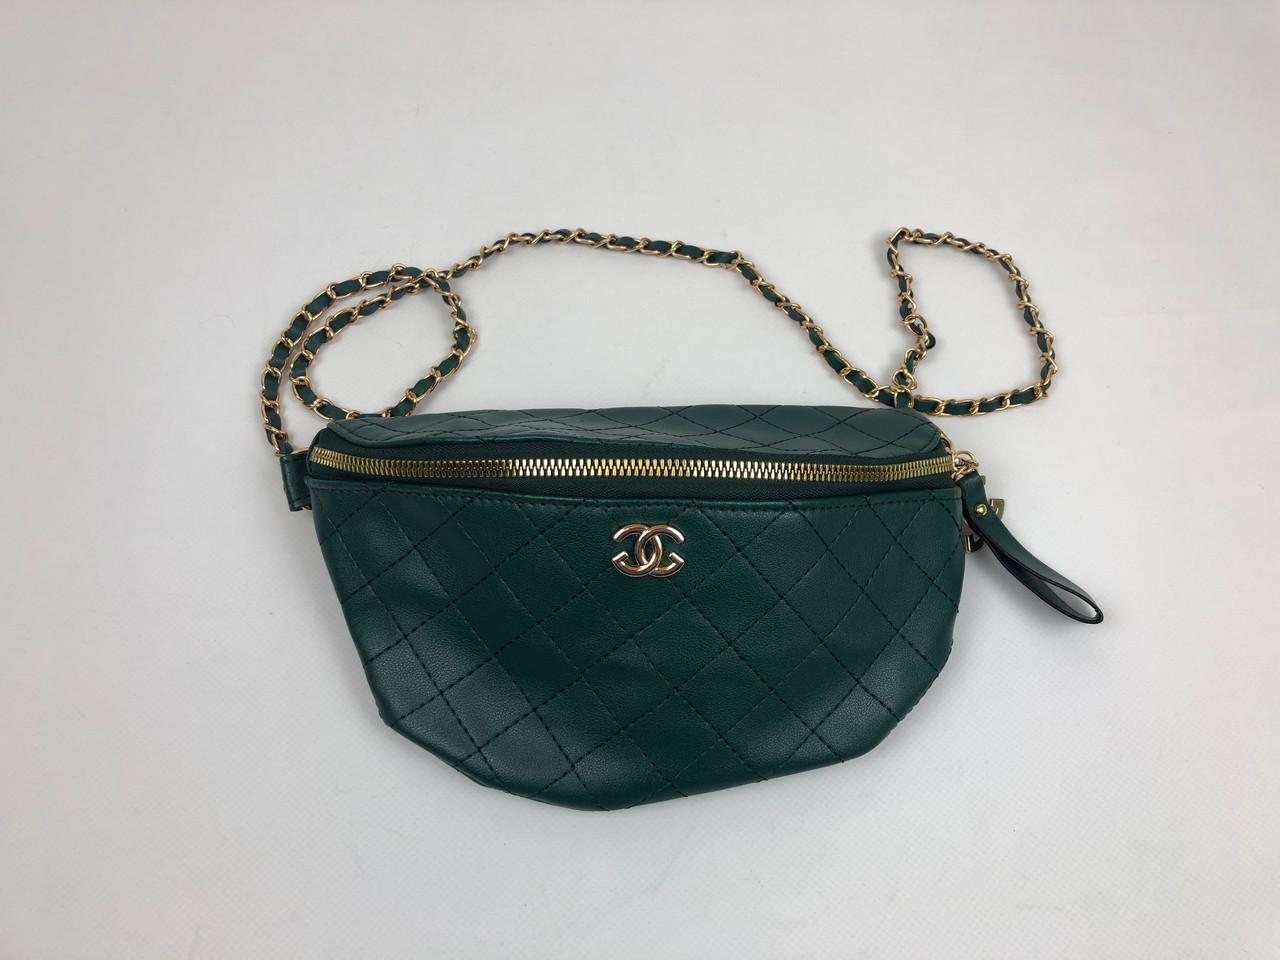 Сумка женская Gucci Темно-зеленая